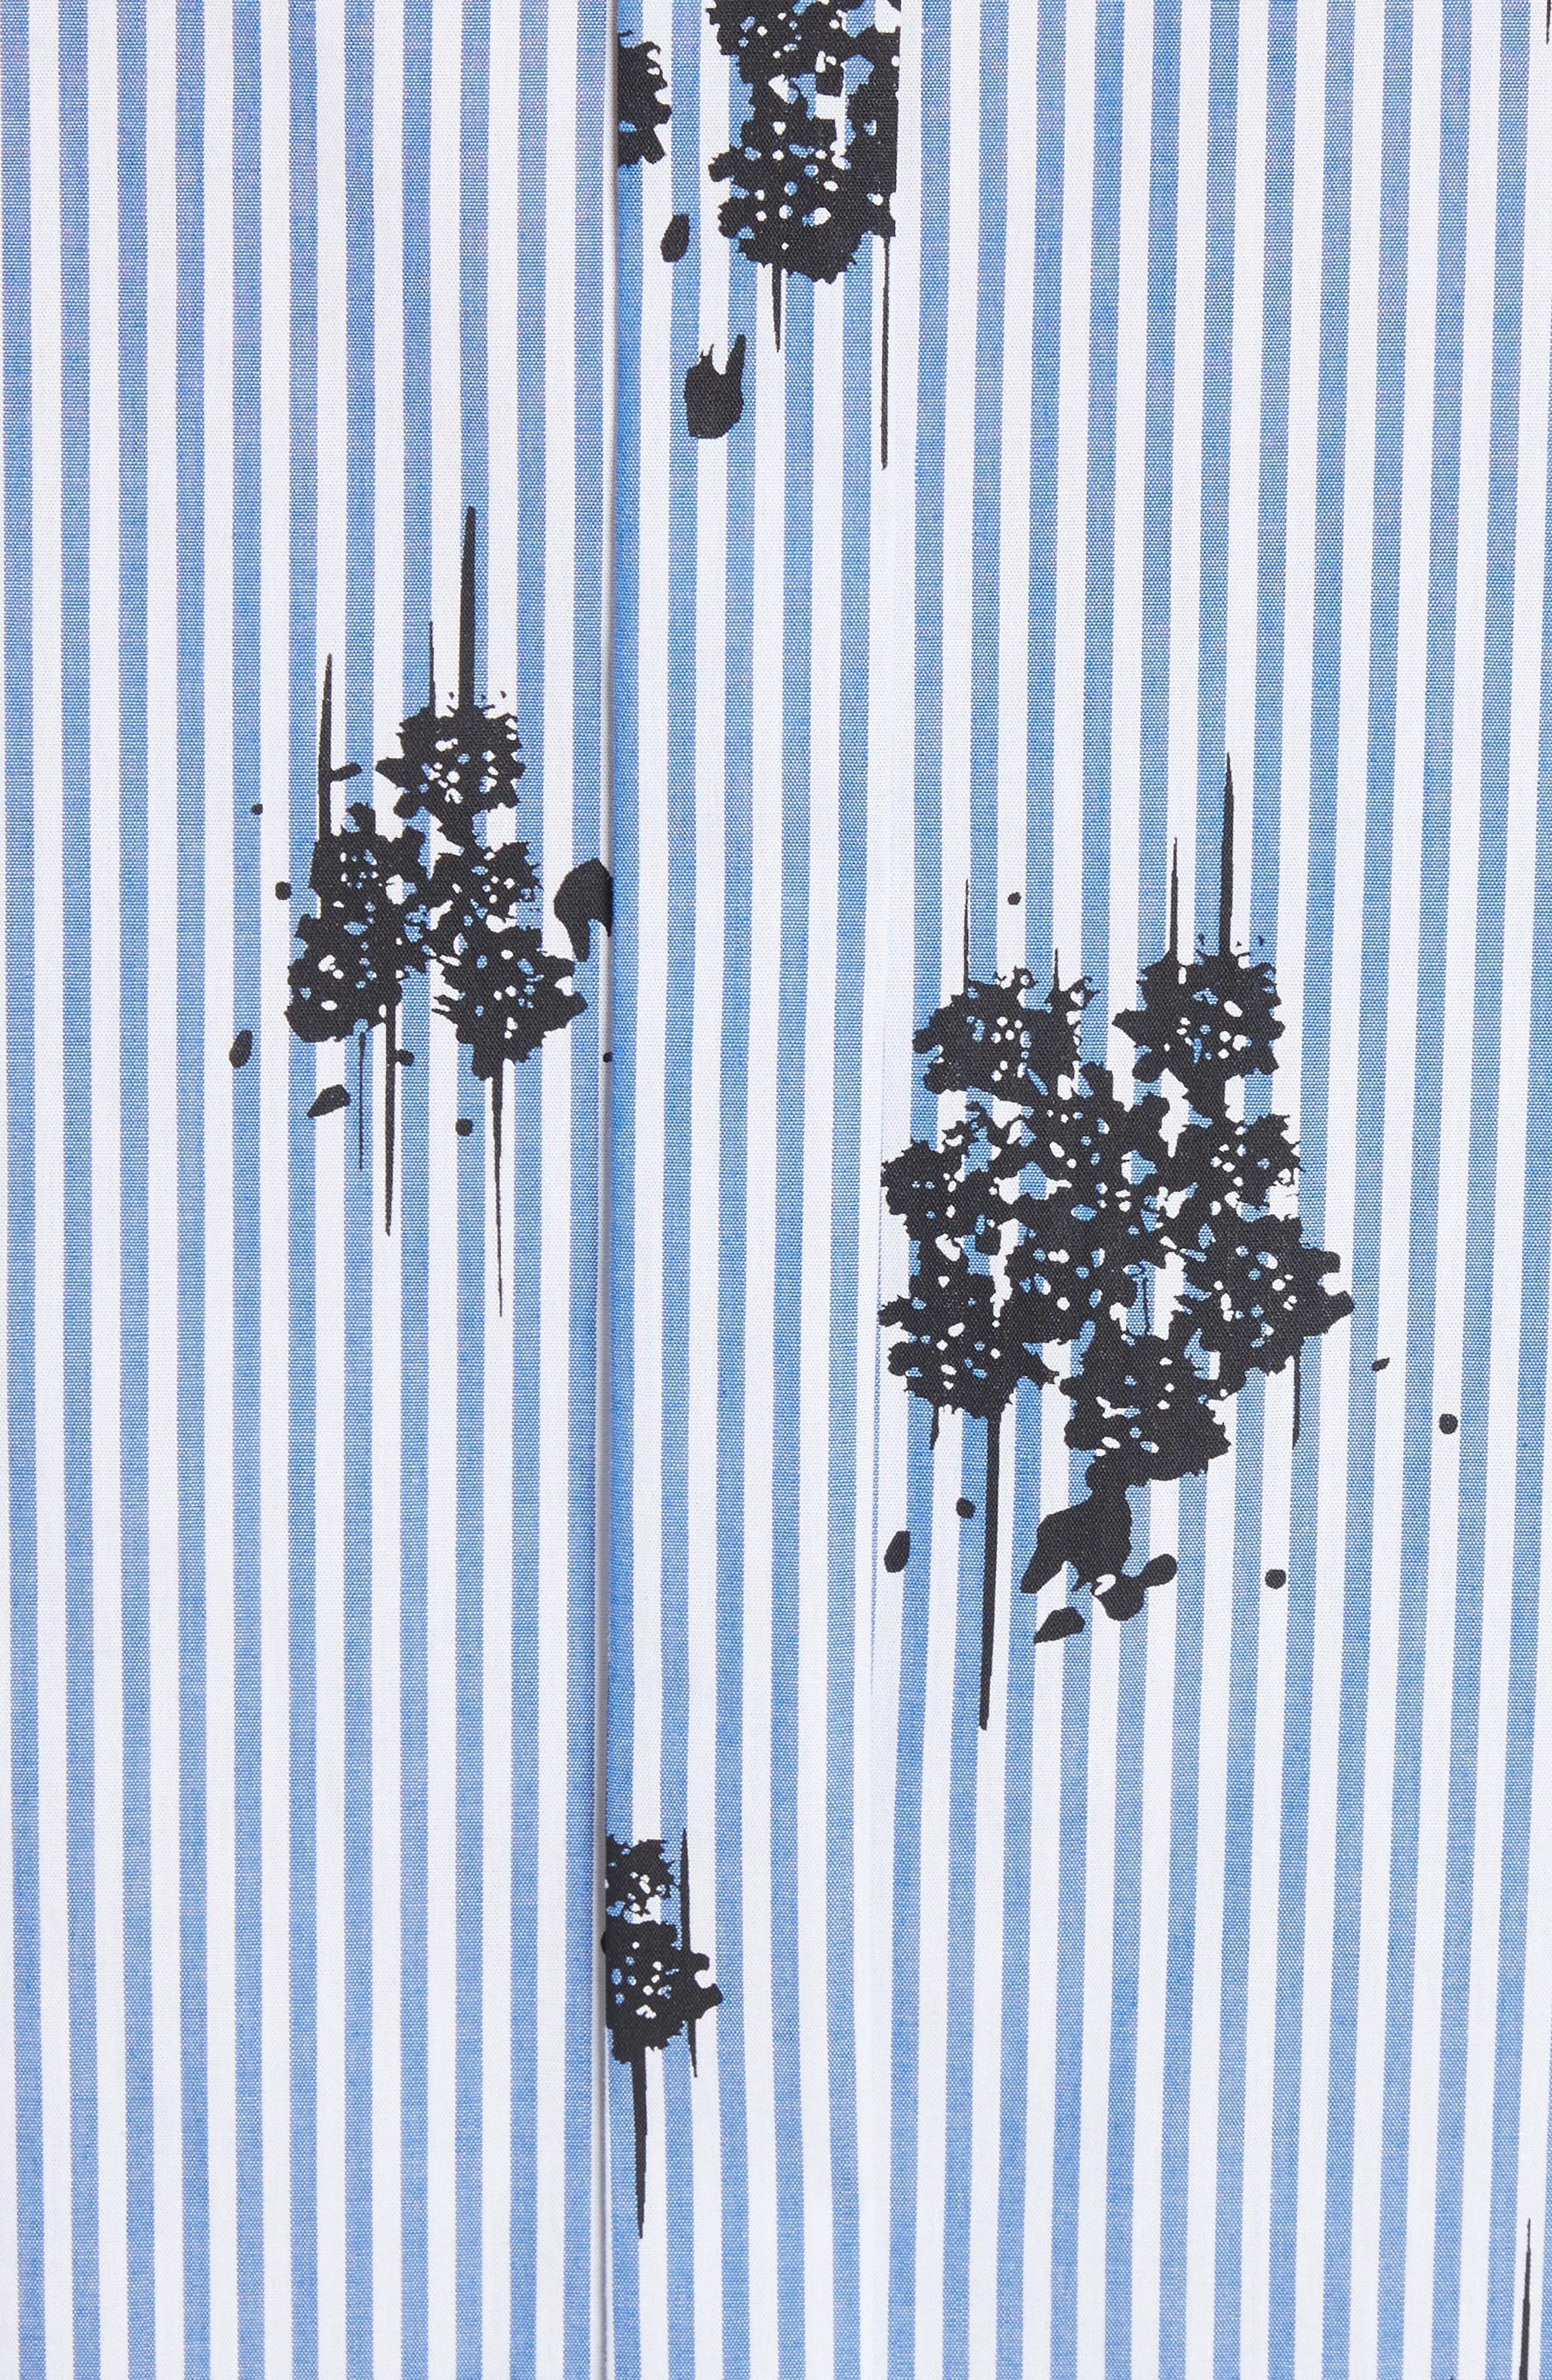 2-in-1 Ruffled Shirtdress,                             Alternate thumbnail 6, color,                             Blue